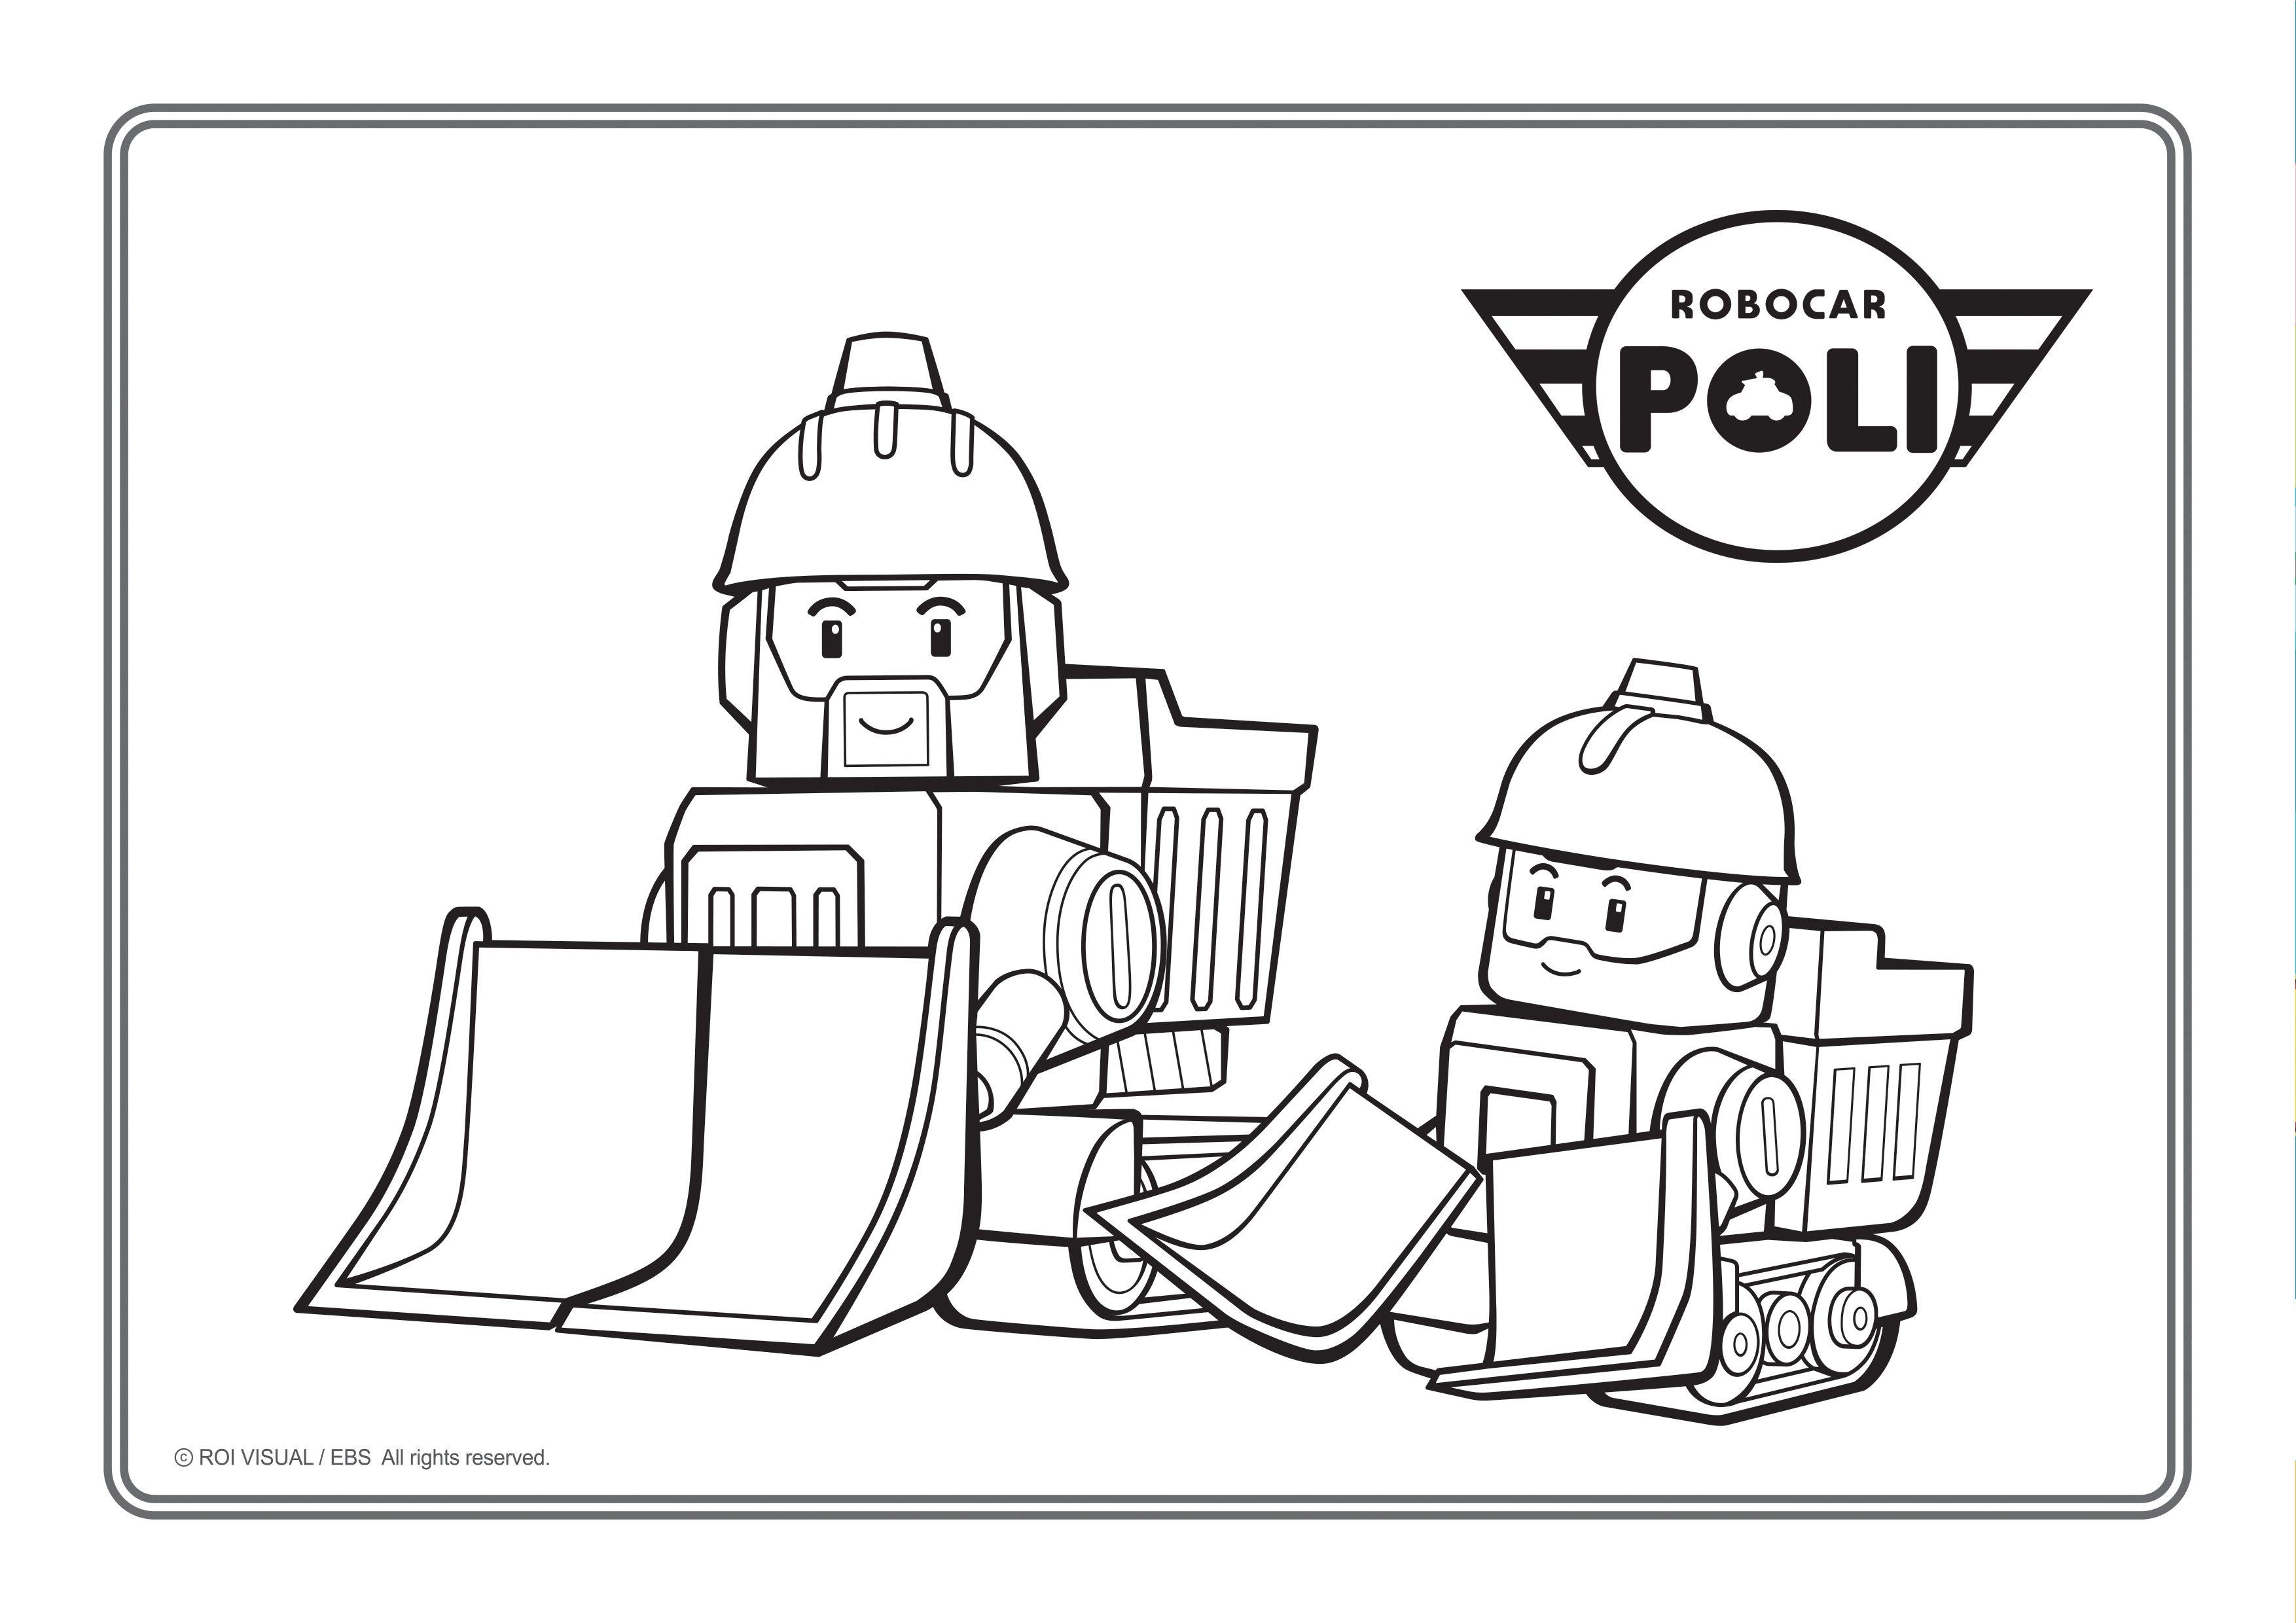 L gant dessins a imprimer robocar poli - Radio car poli ...